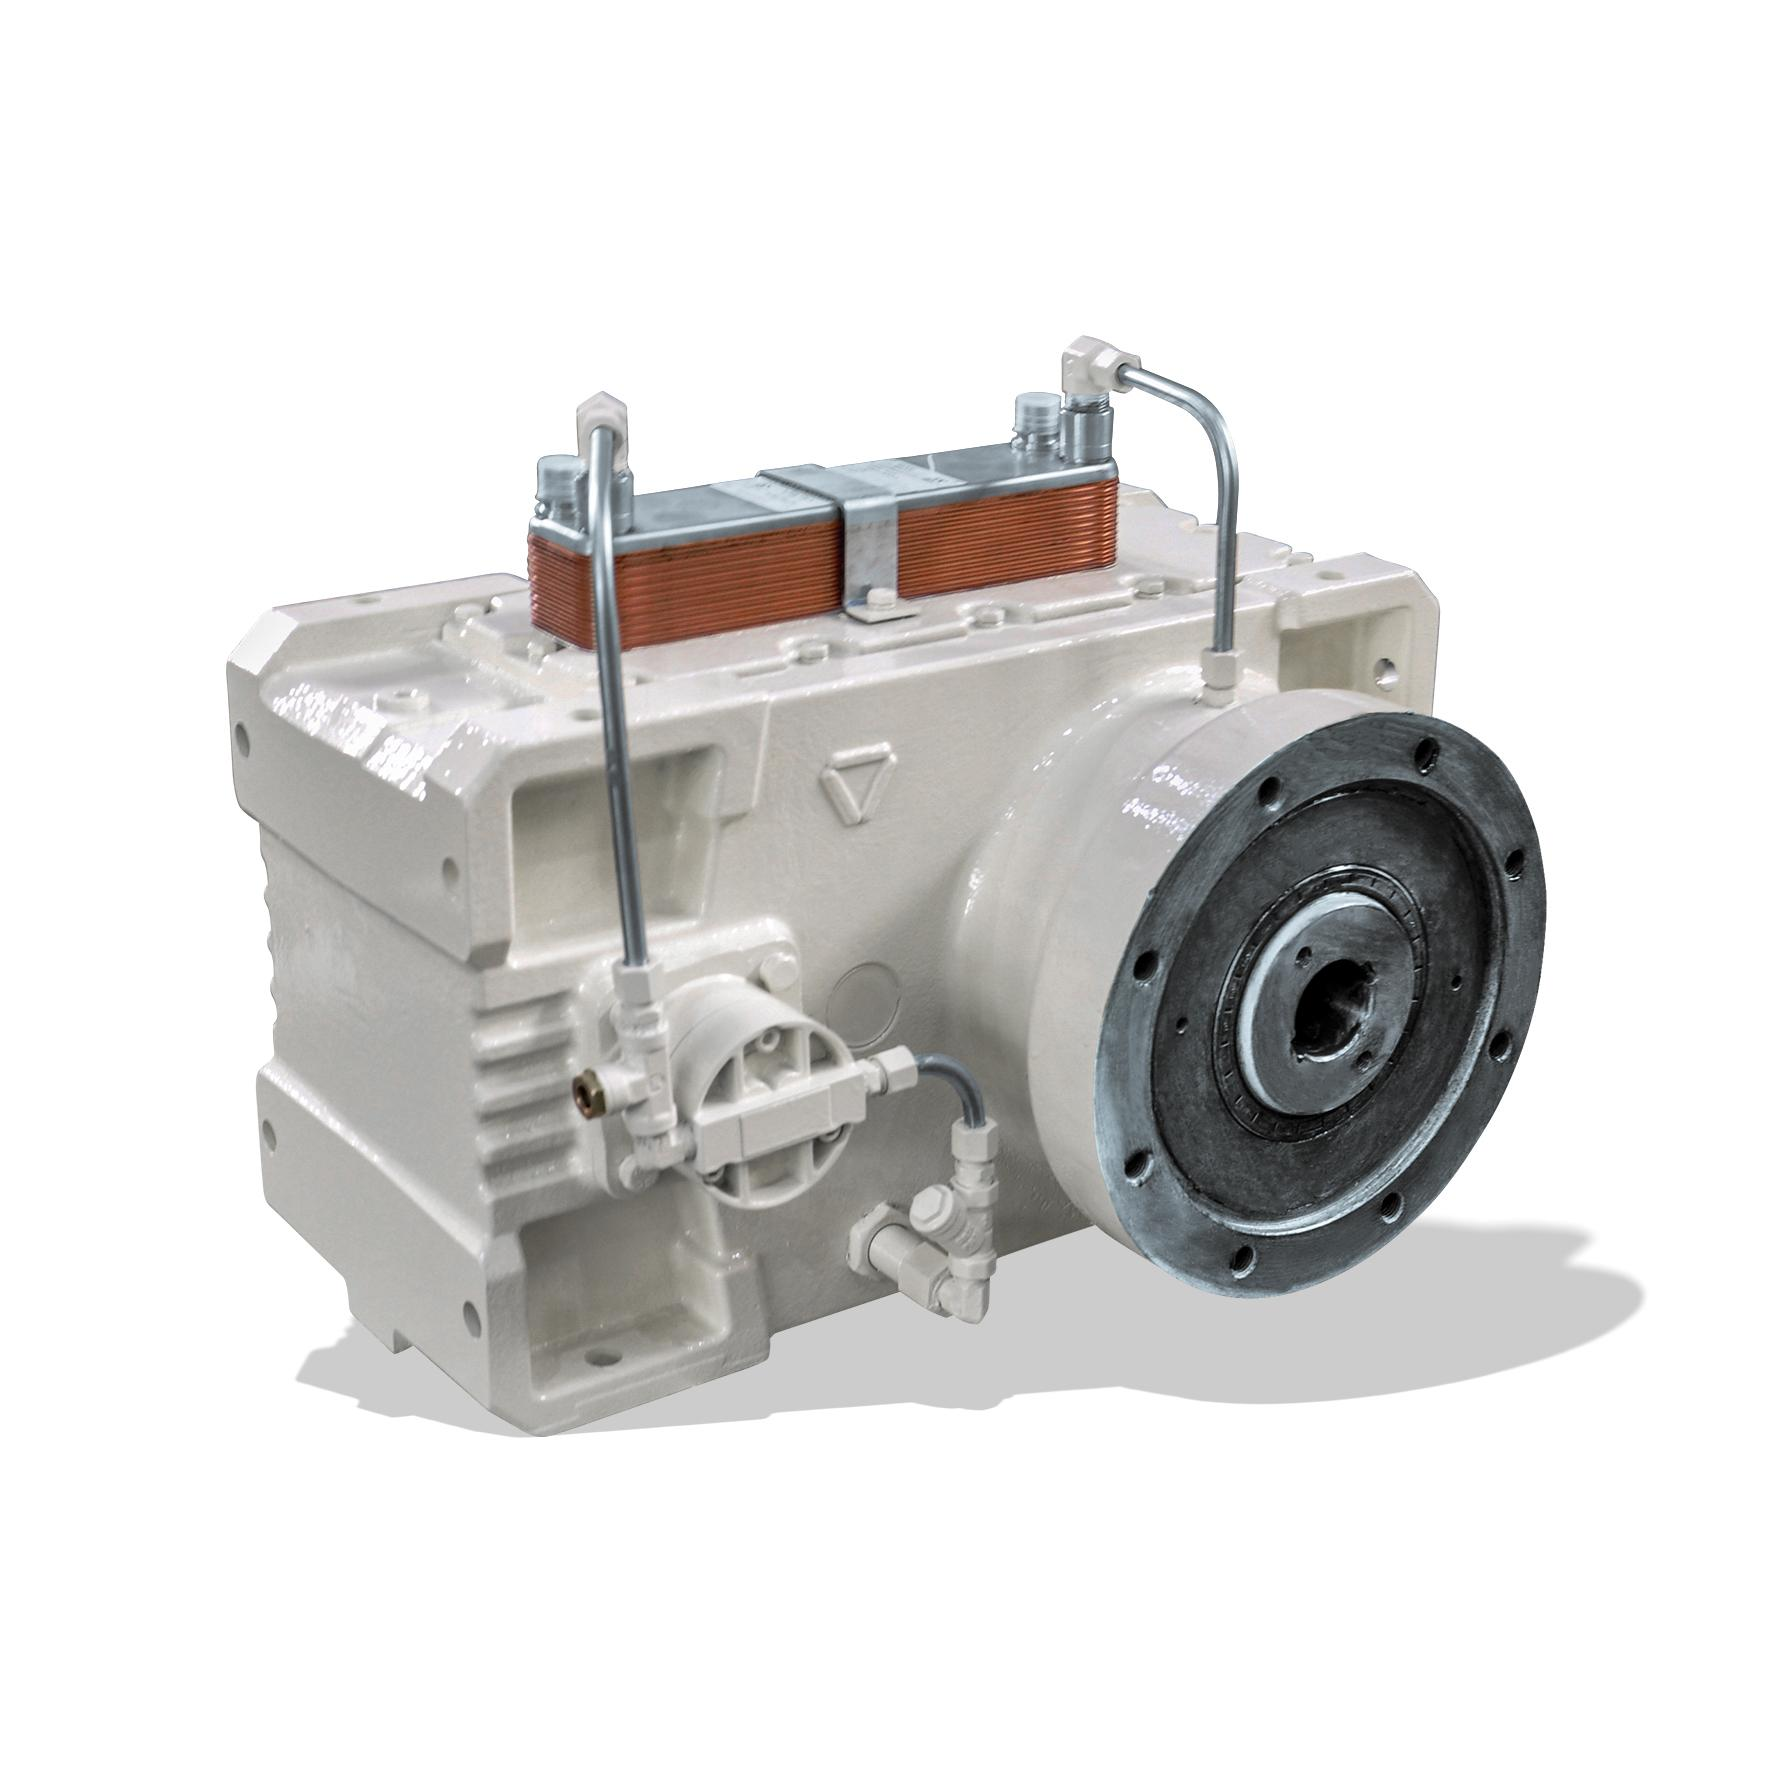 REDSUN ZLYJ series helical gearbox for plastic single screw machinery 8